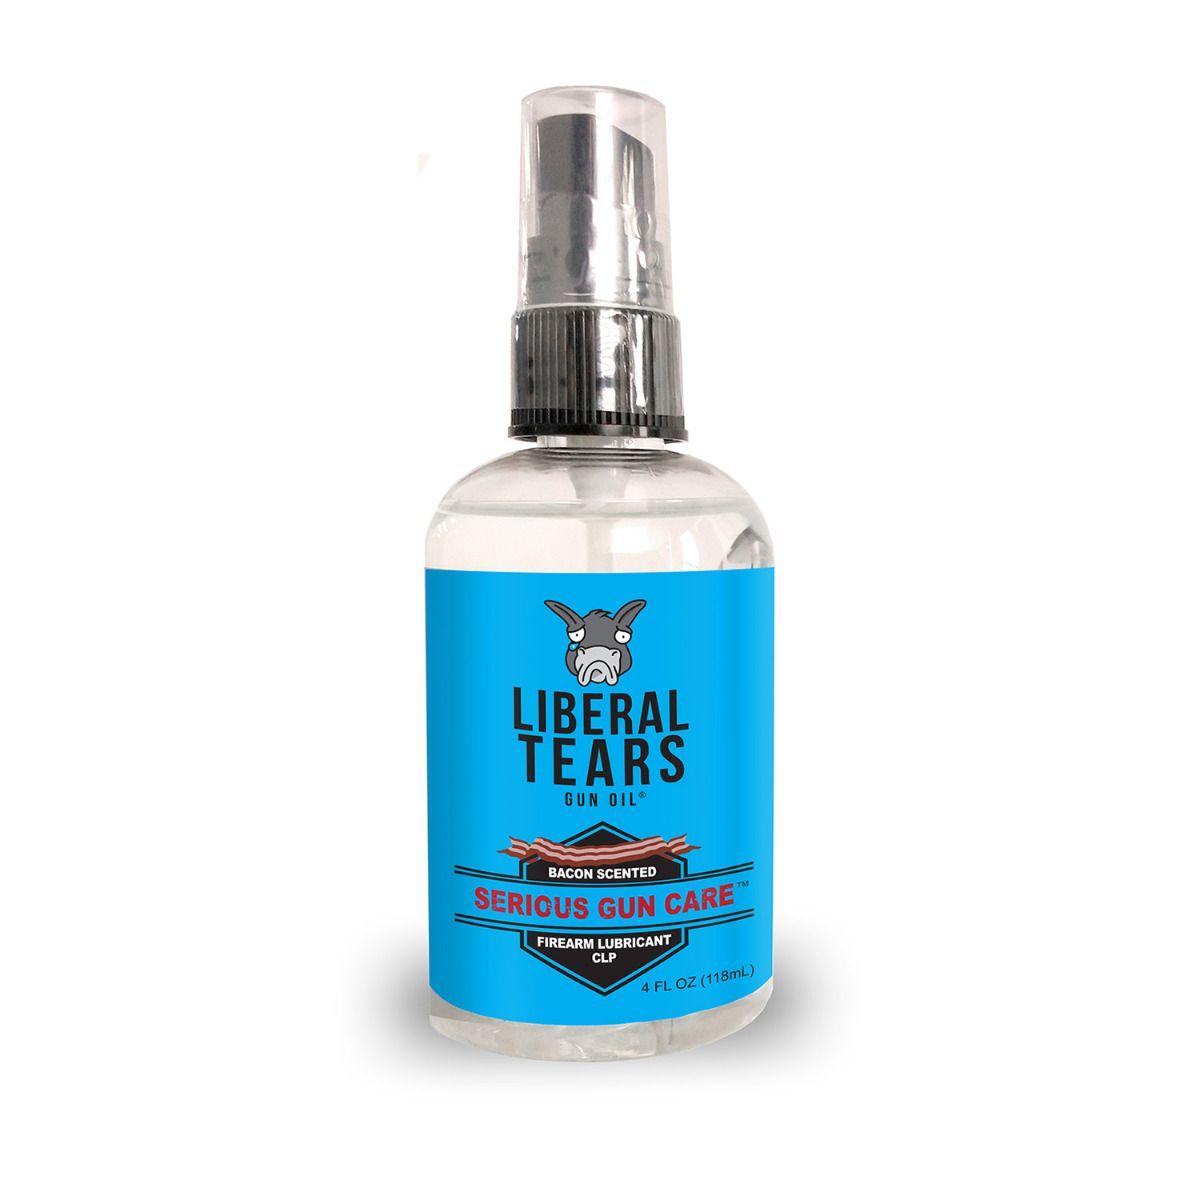 57eb3685fee9 Liberal Tears Gun Oil - Bacon Scented - 4oz